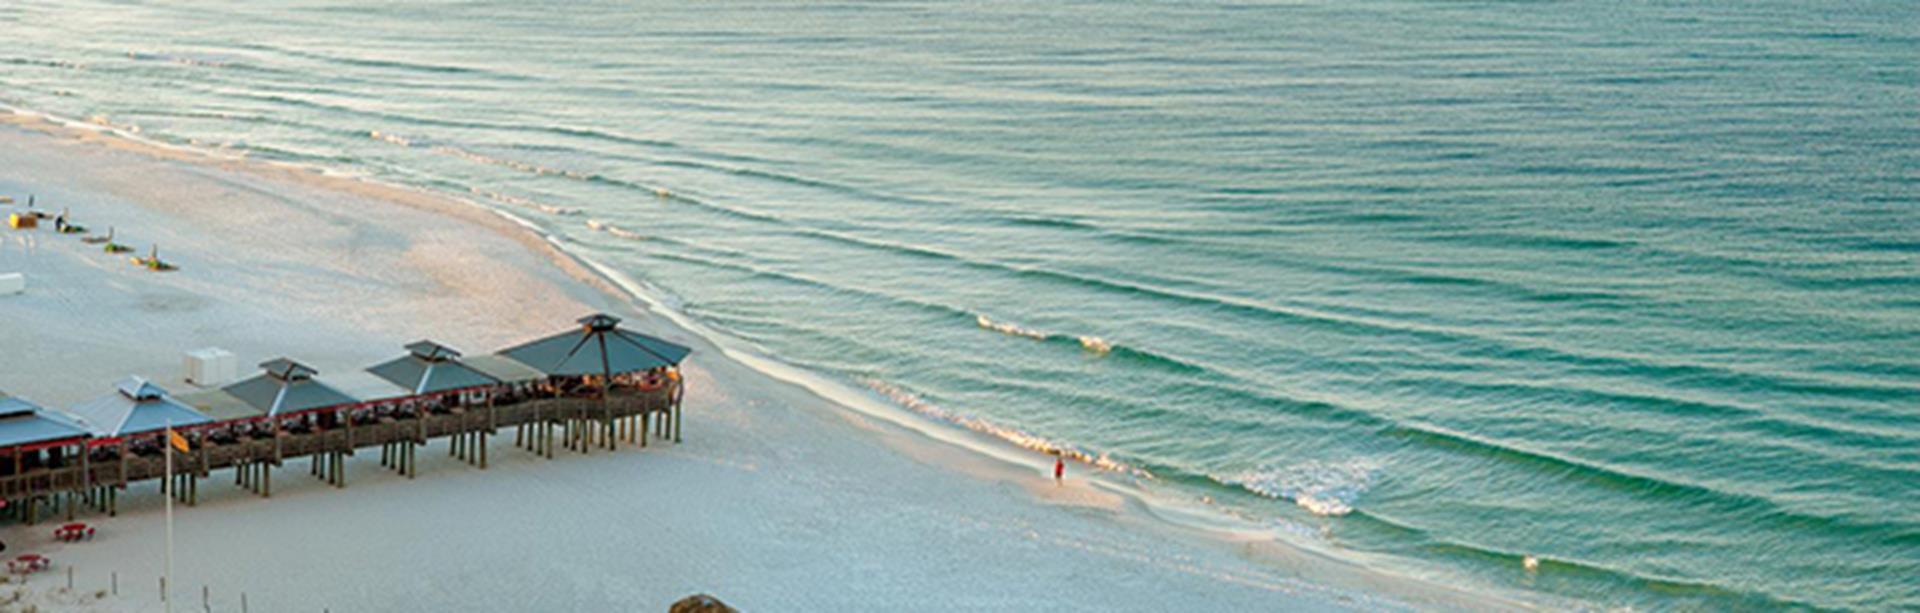 Plan a Fun Reunion in Panama City Beach